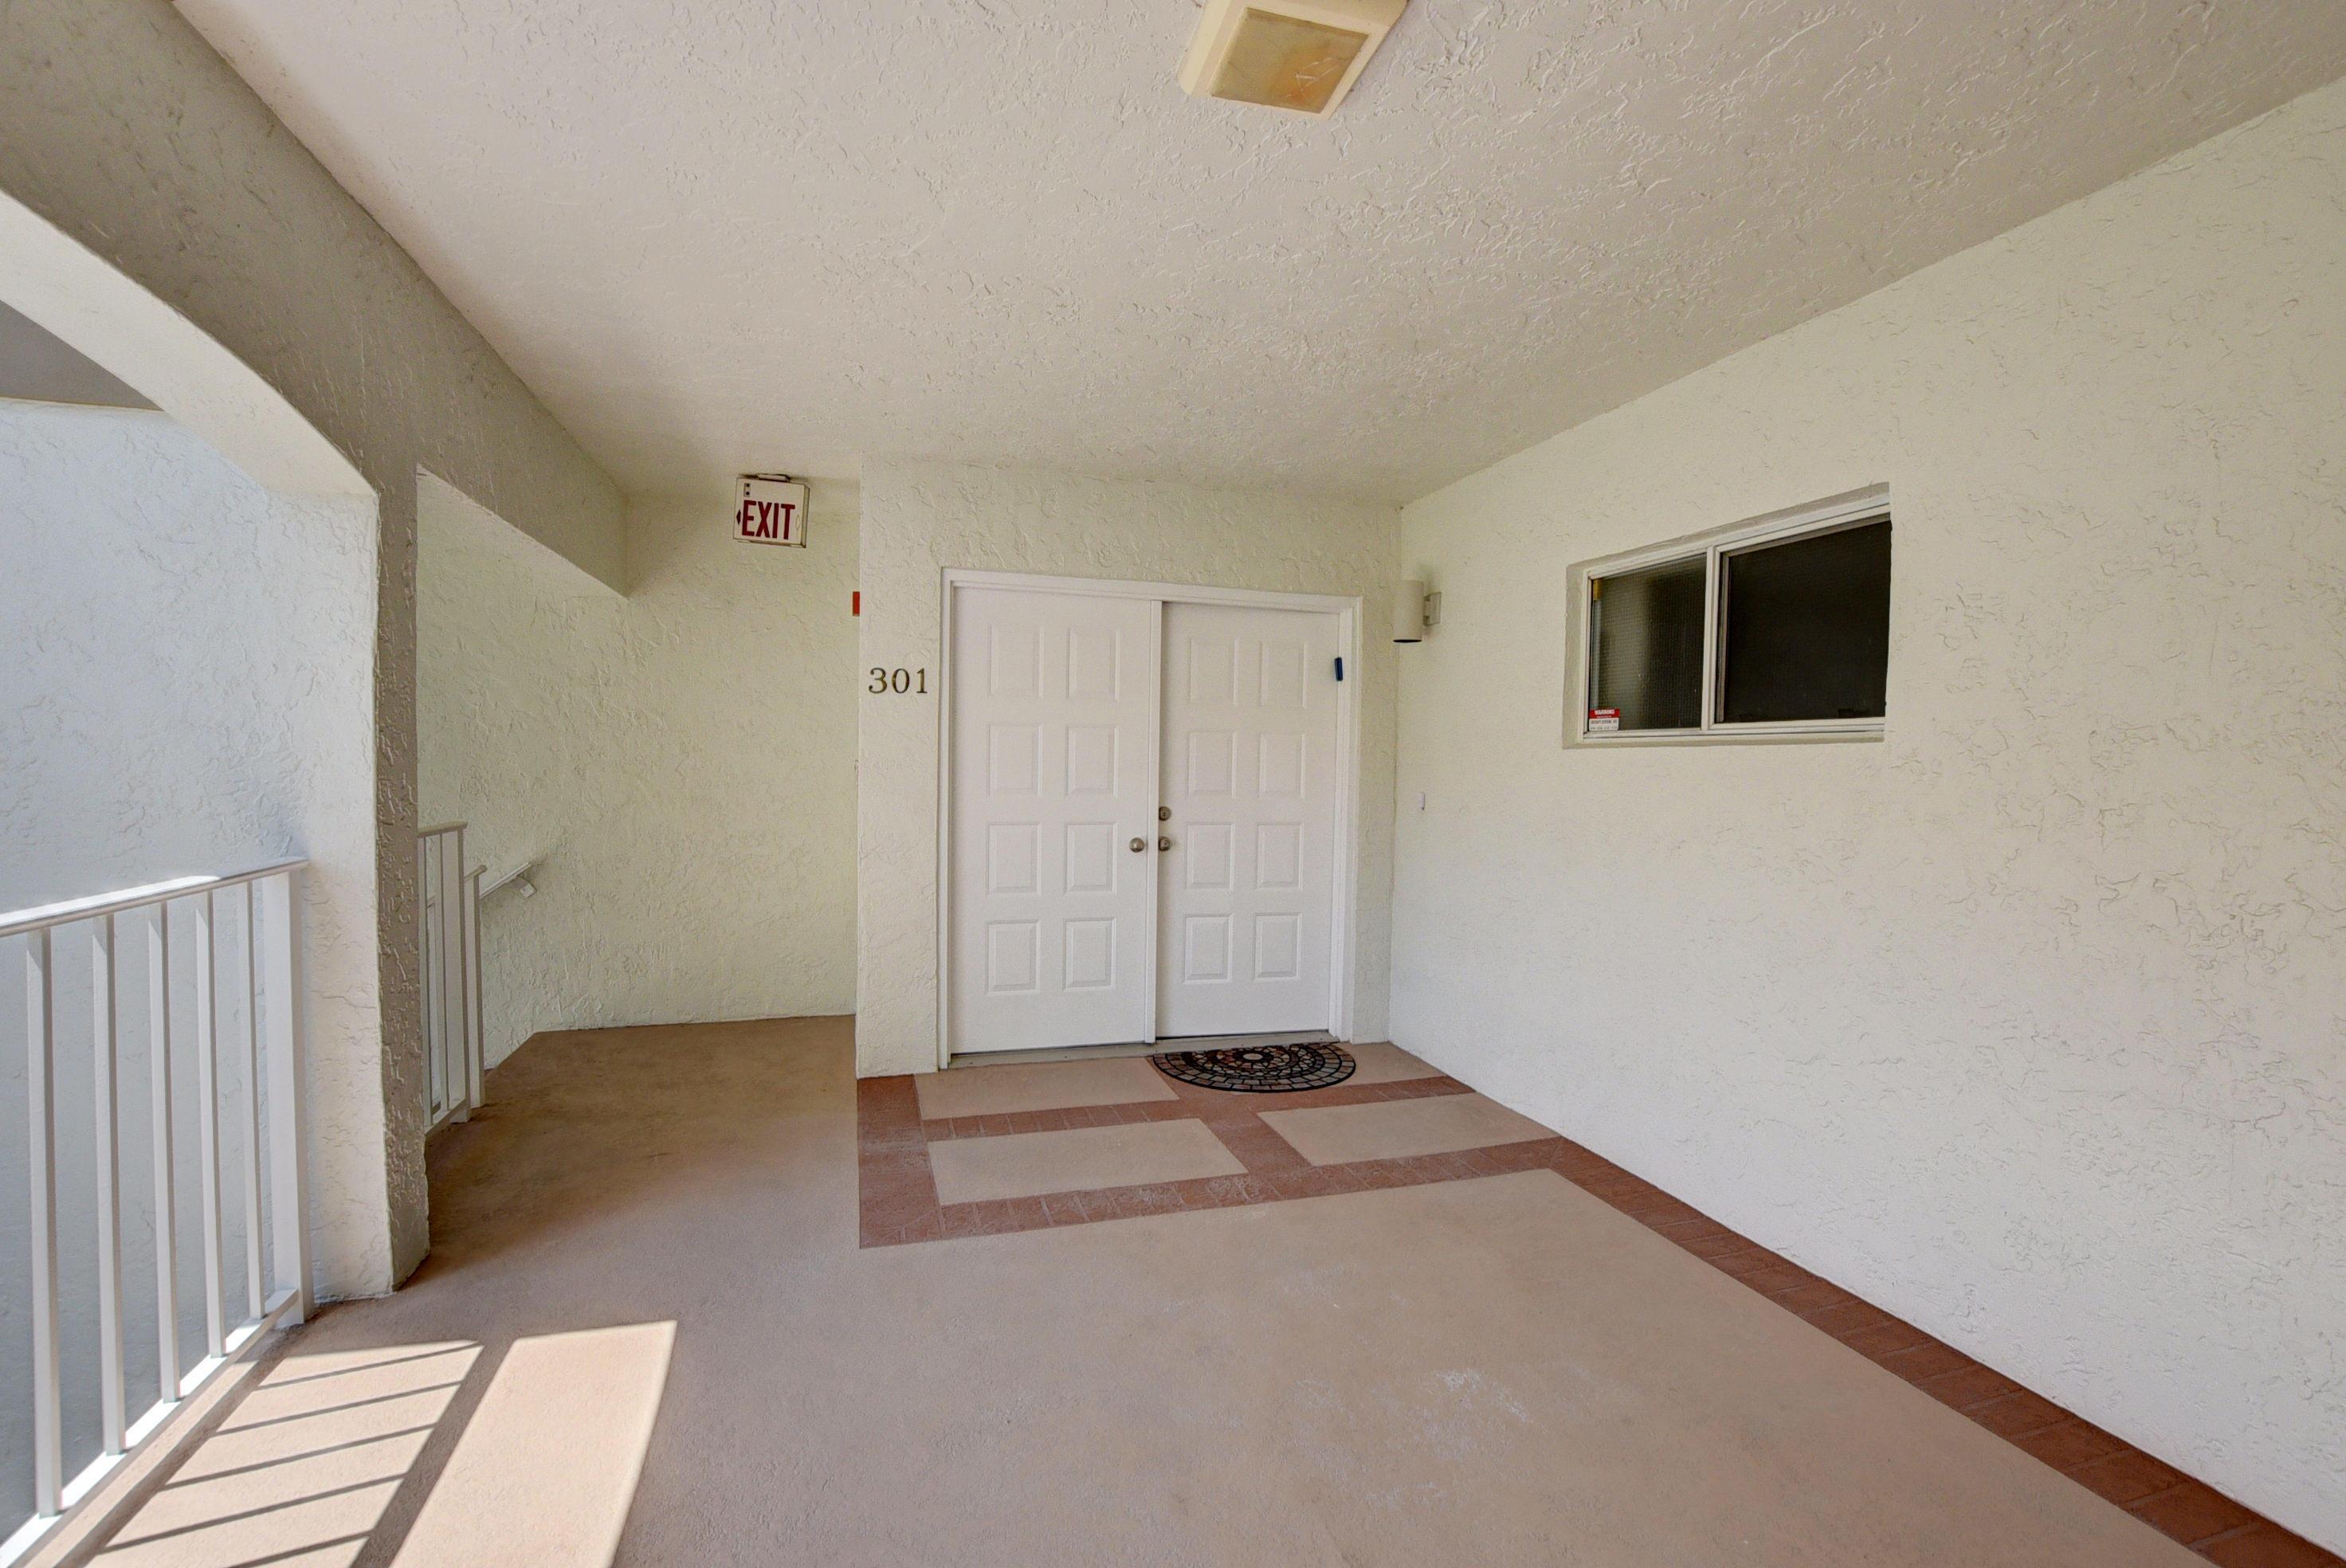 7369 Orangewood Lane #301 Boca Raton, FL 33433